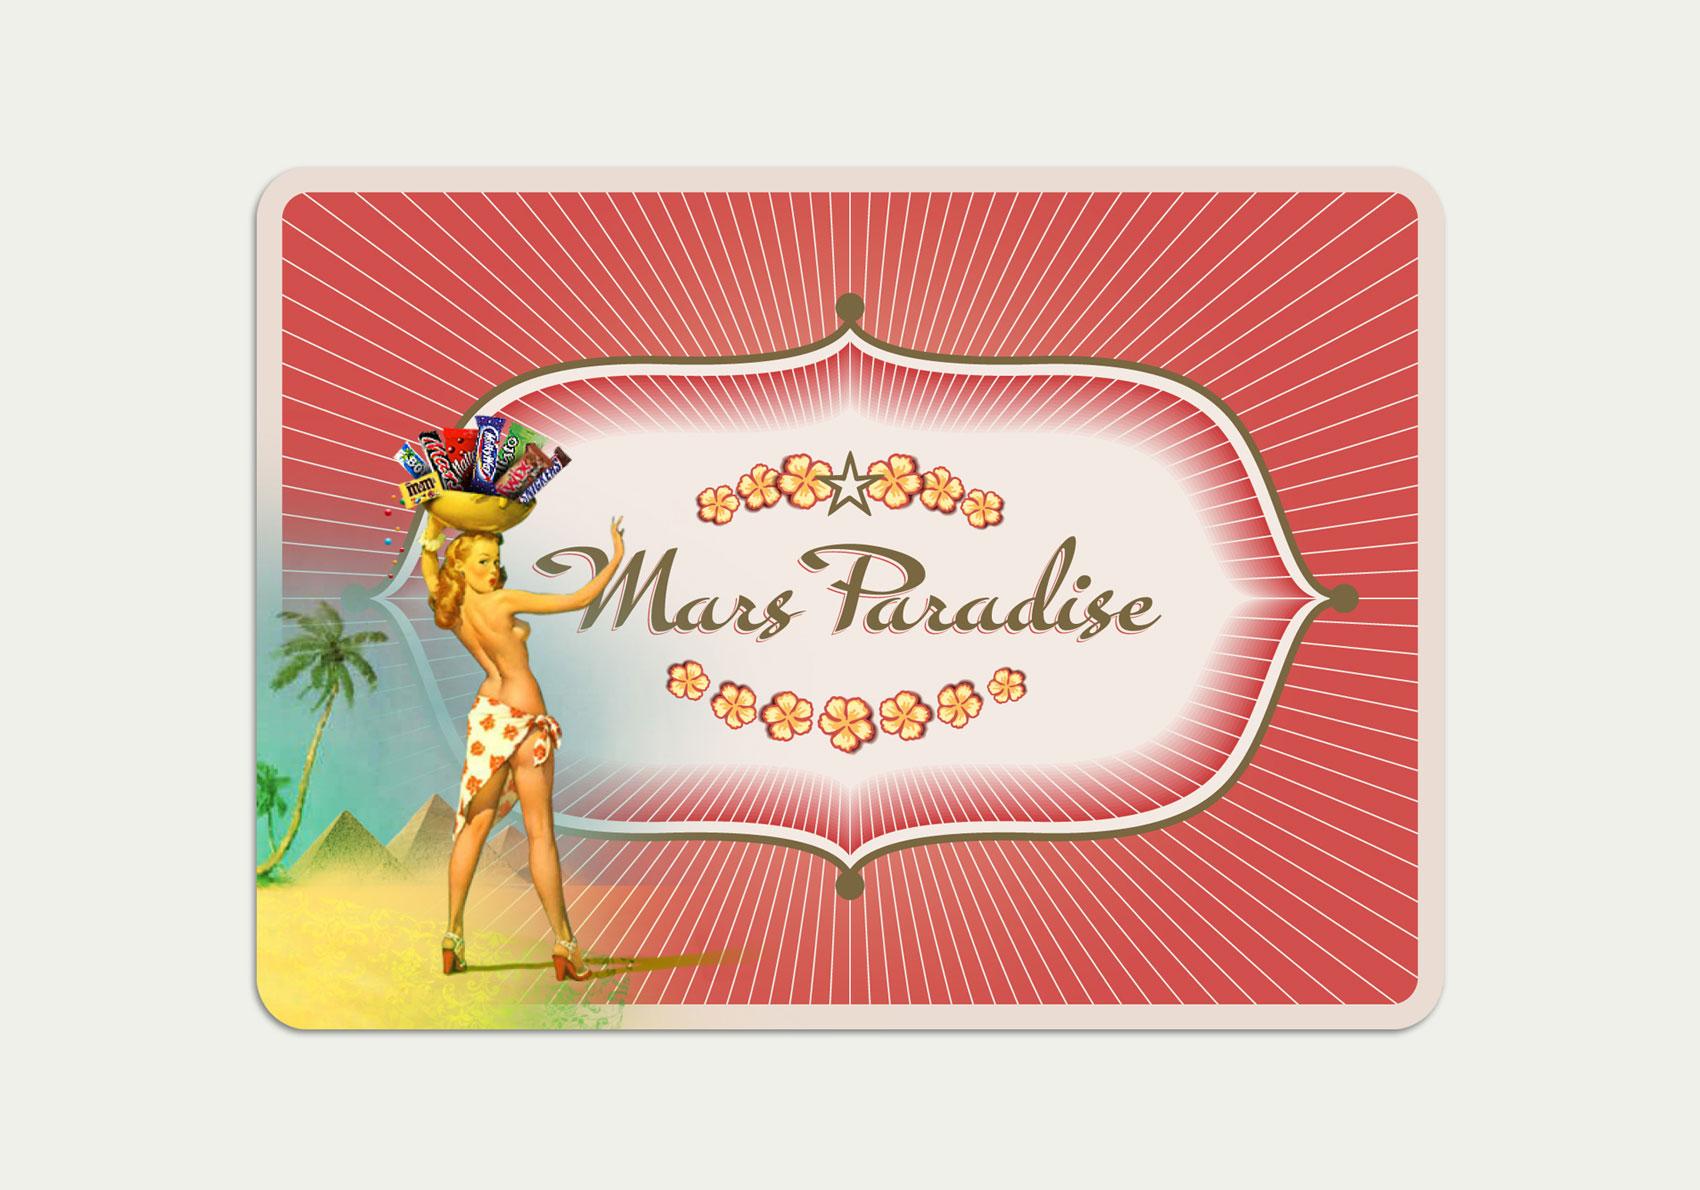 mars-paradise-1